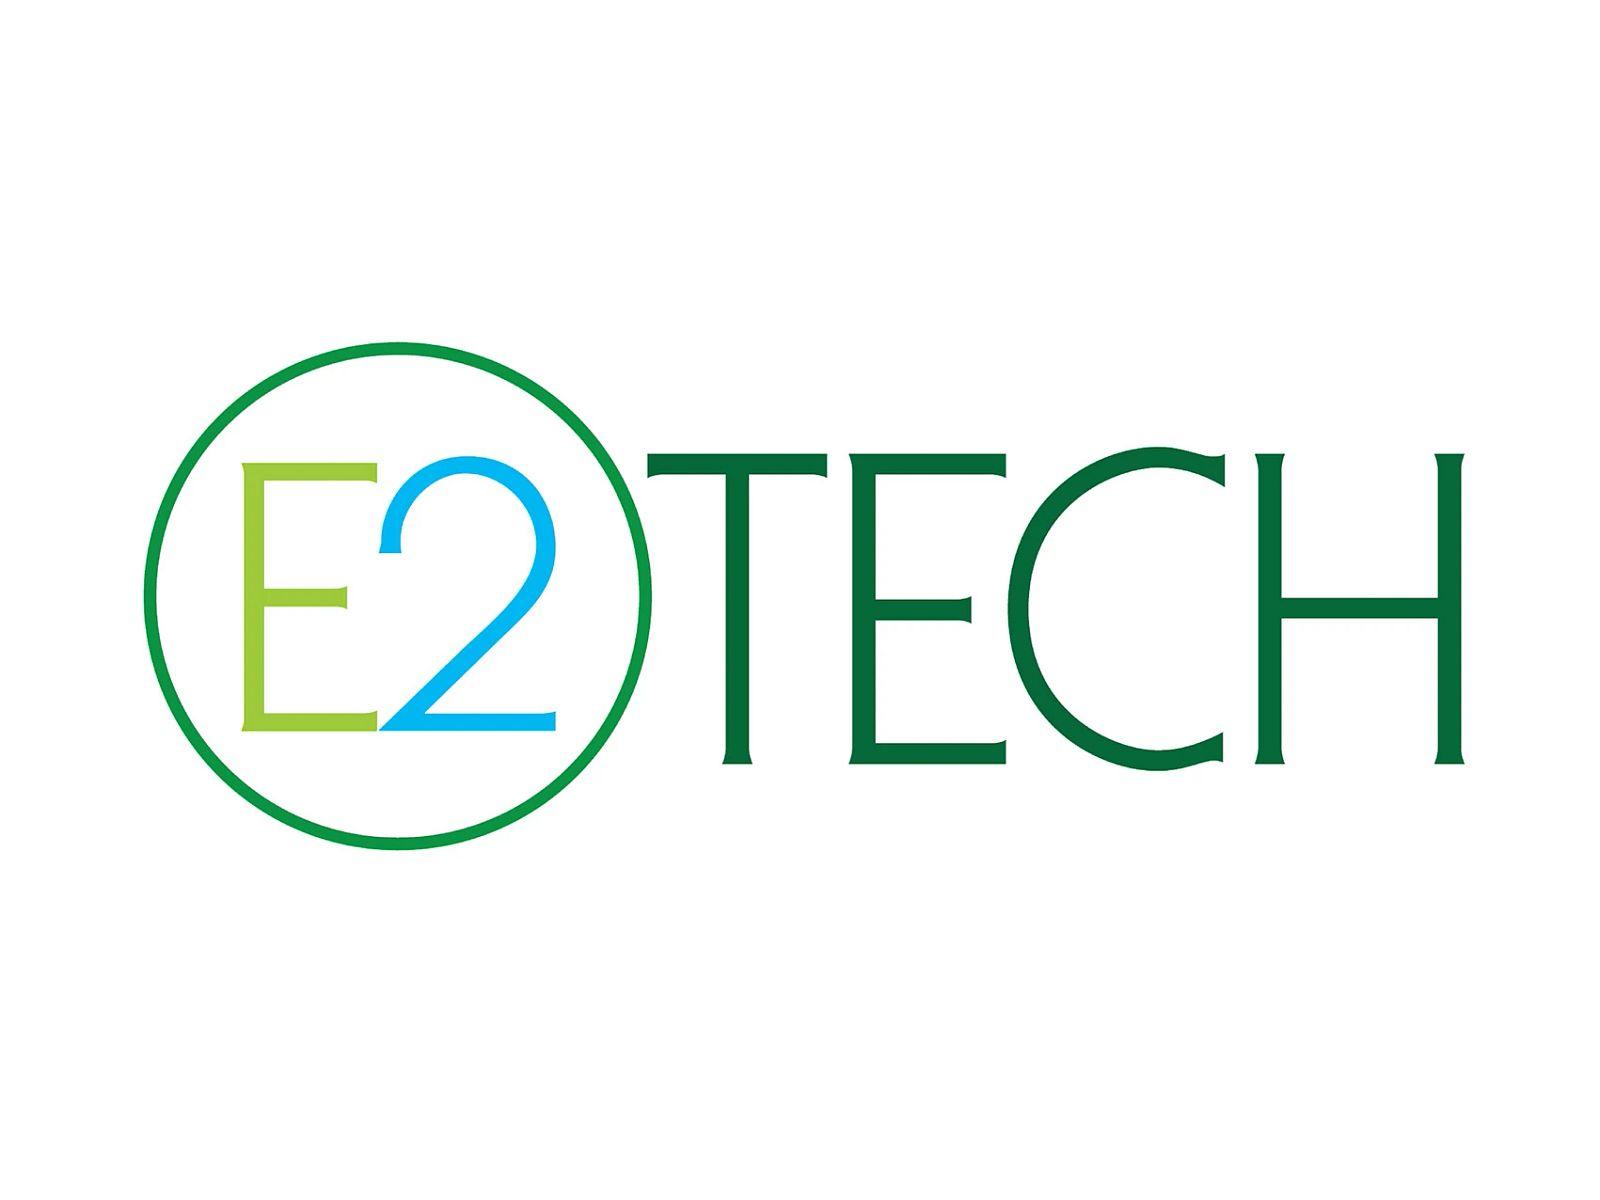 Grid-Affiliate-E2-Tech-logo.jpg